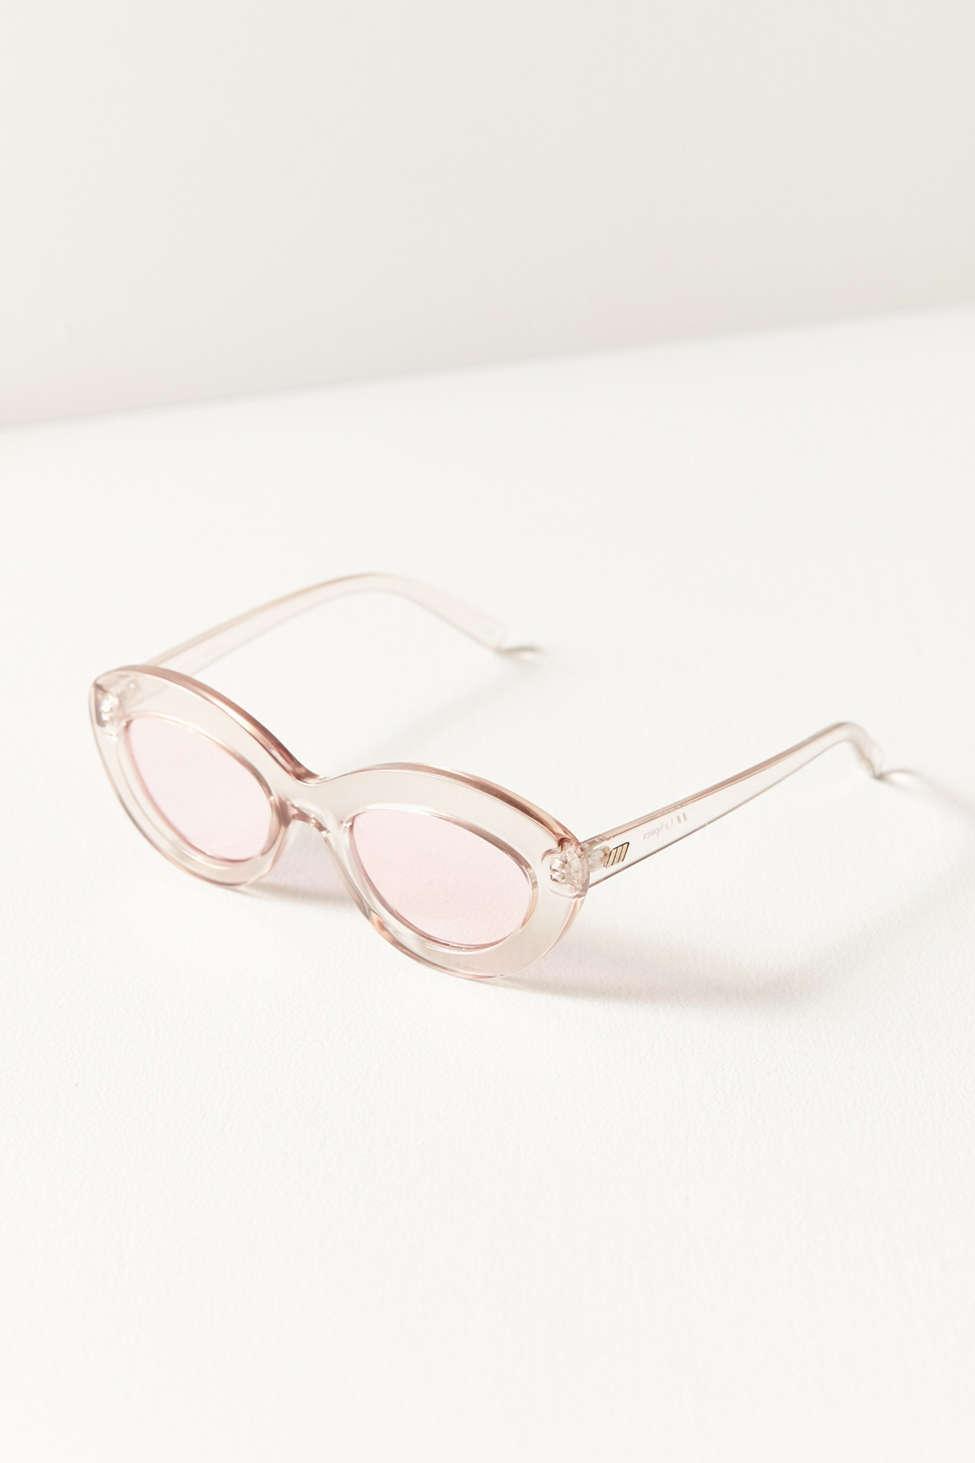 a0575cfab05 Lyst - Le Specs Fluxus Oval Sunglasses